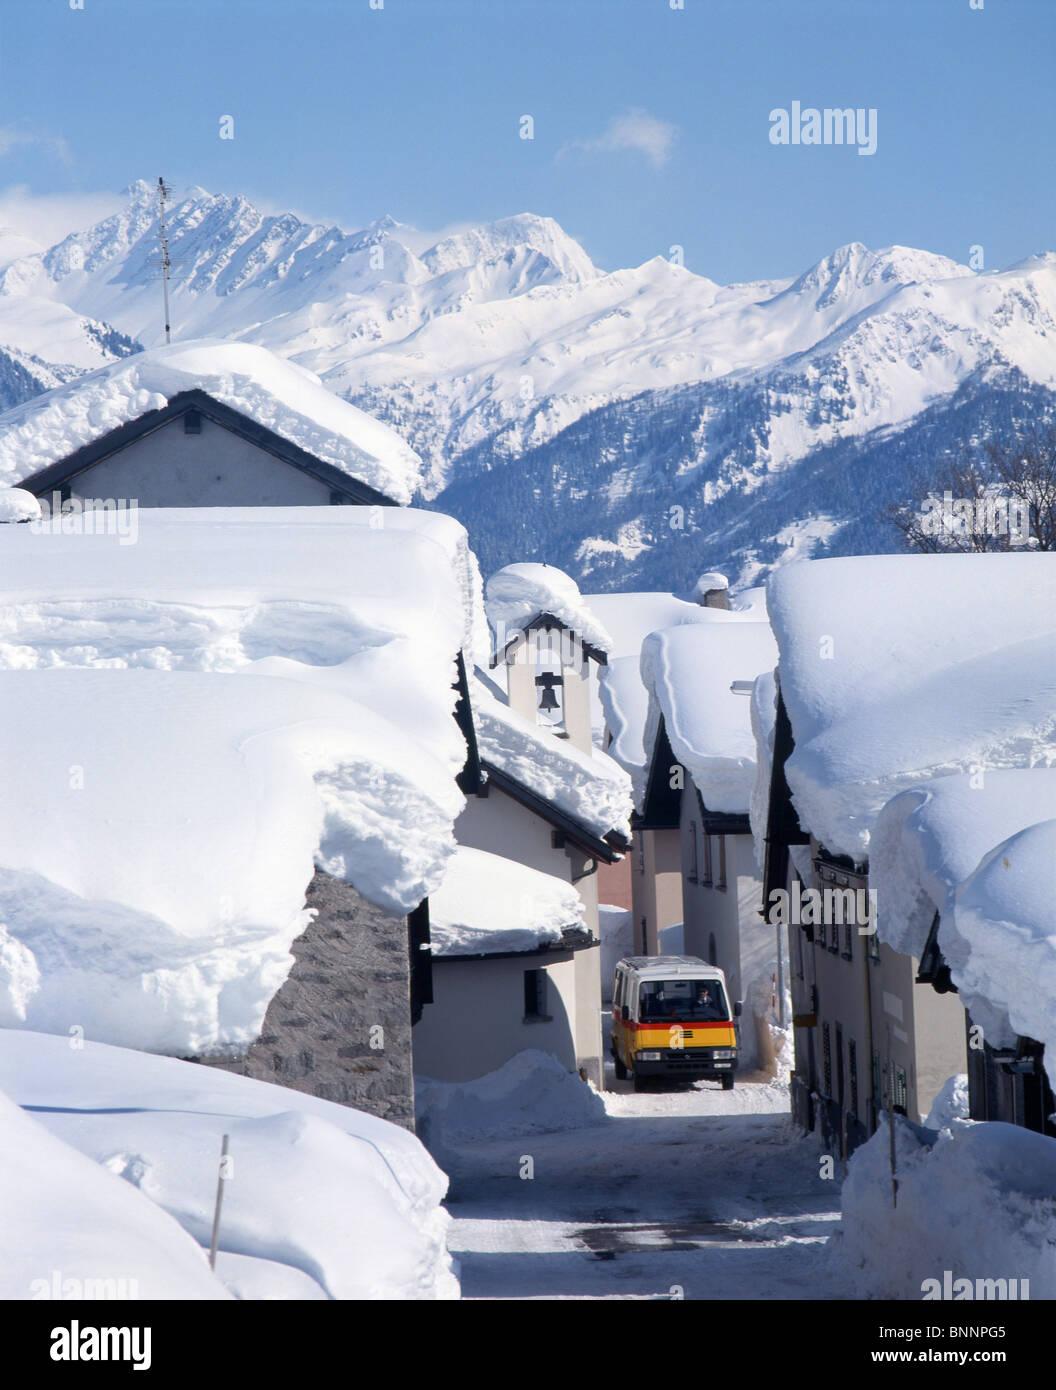 Bedrettotal TI postal car bus winter village snowy masses roofs snowy snow canton Ticino Südschweiz village - Stock Image